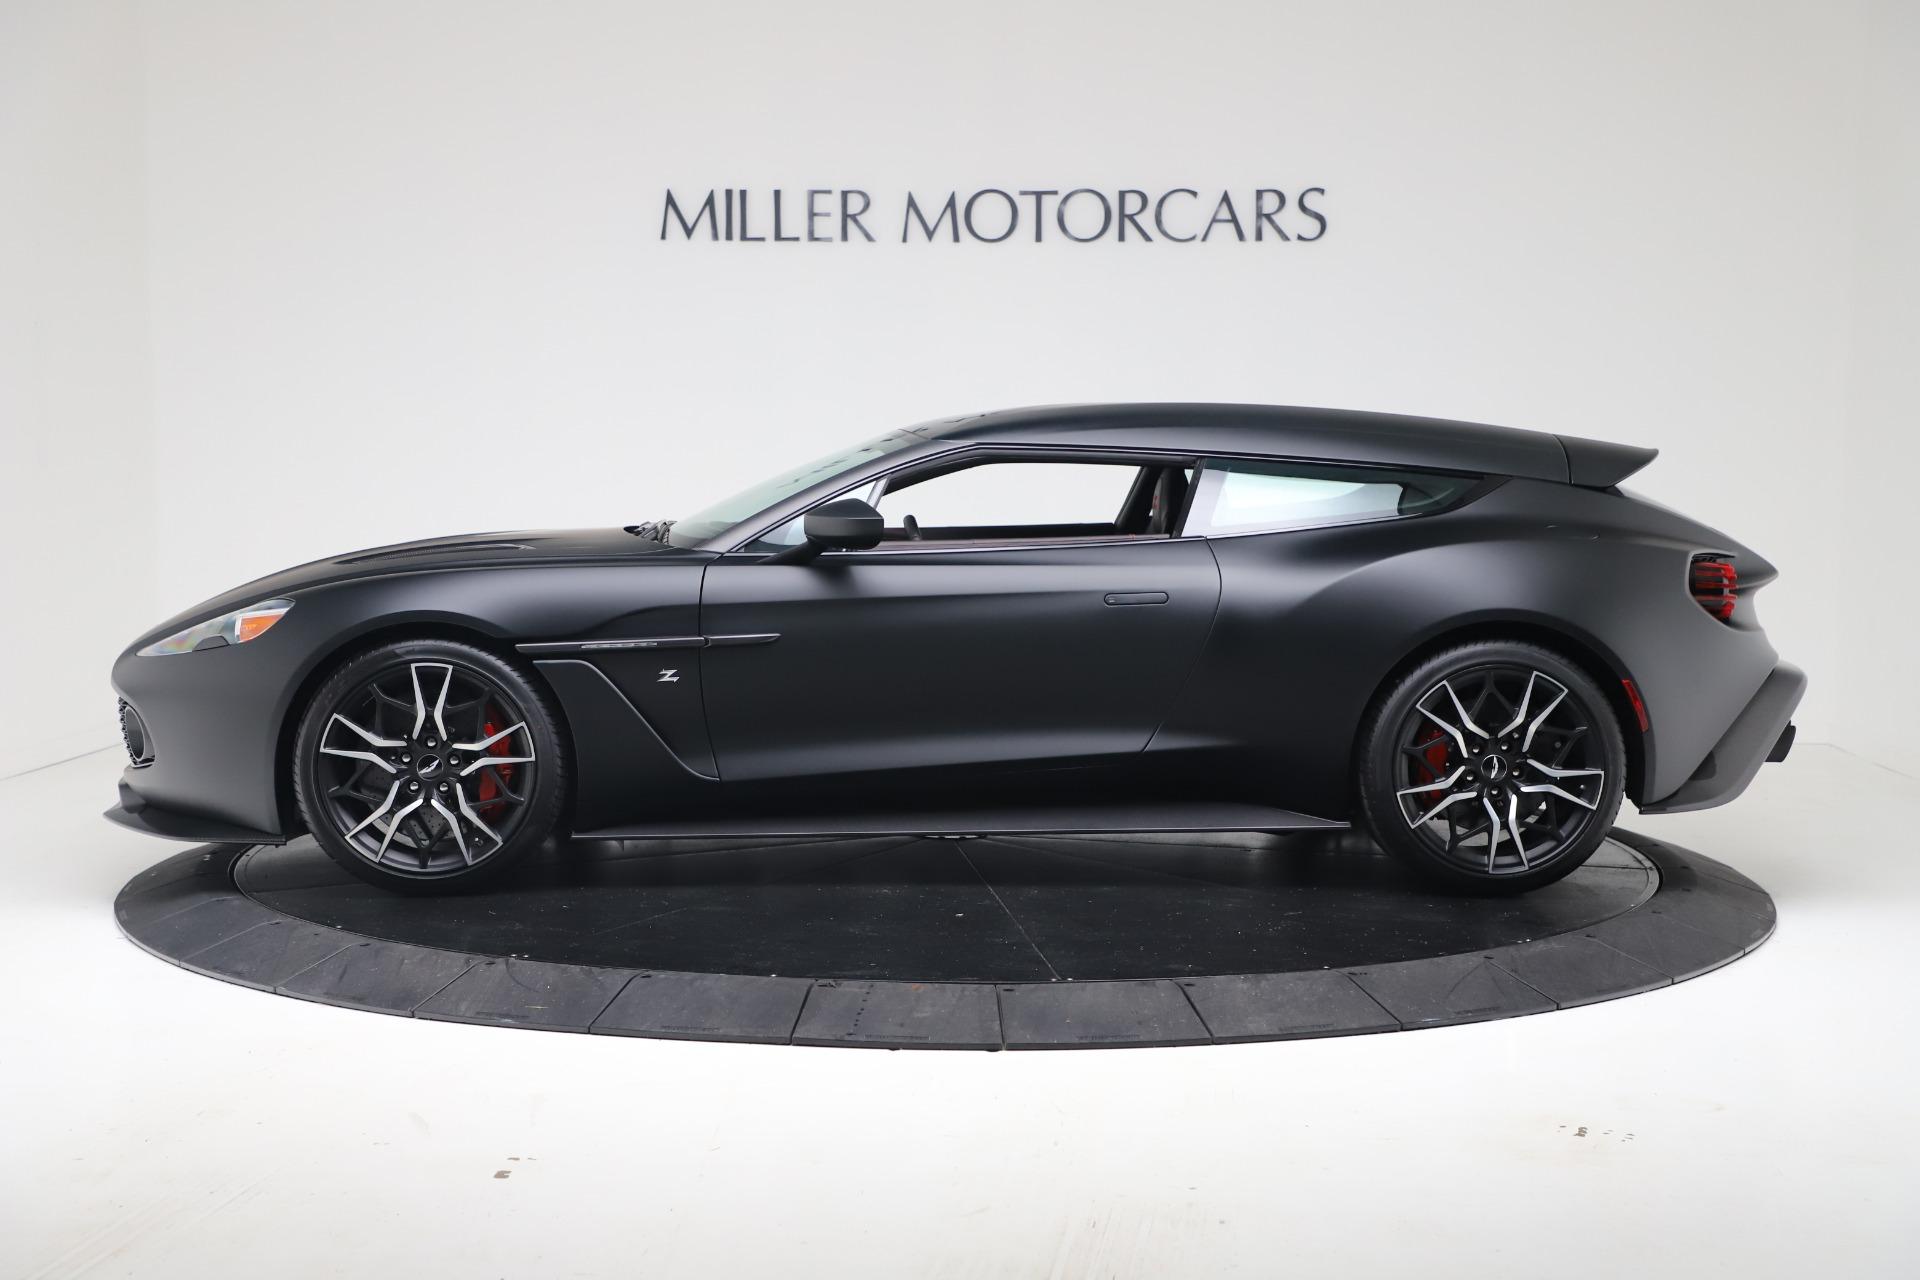 New 2019 Aston Martin Vanquish Zagato Shooting Brake For Sale 909 871 Miller Motorcars Stock 7664c